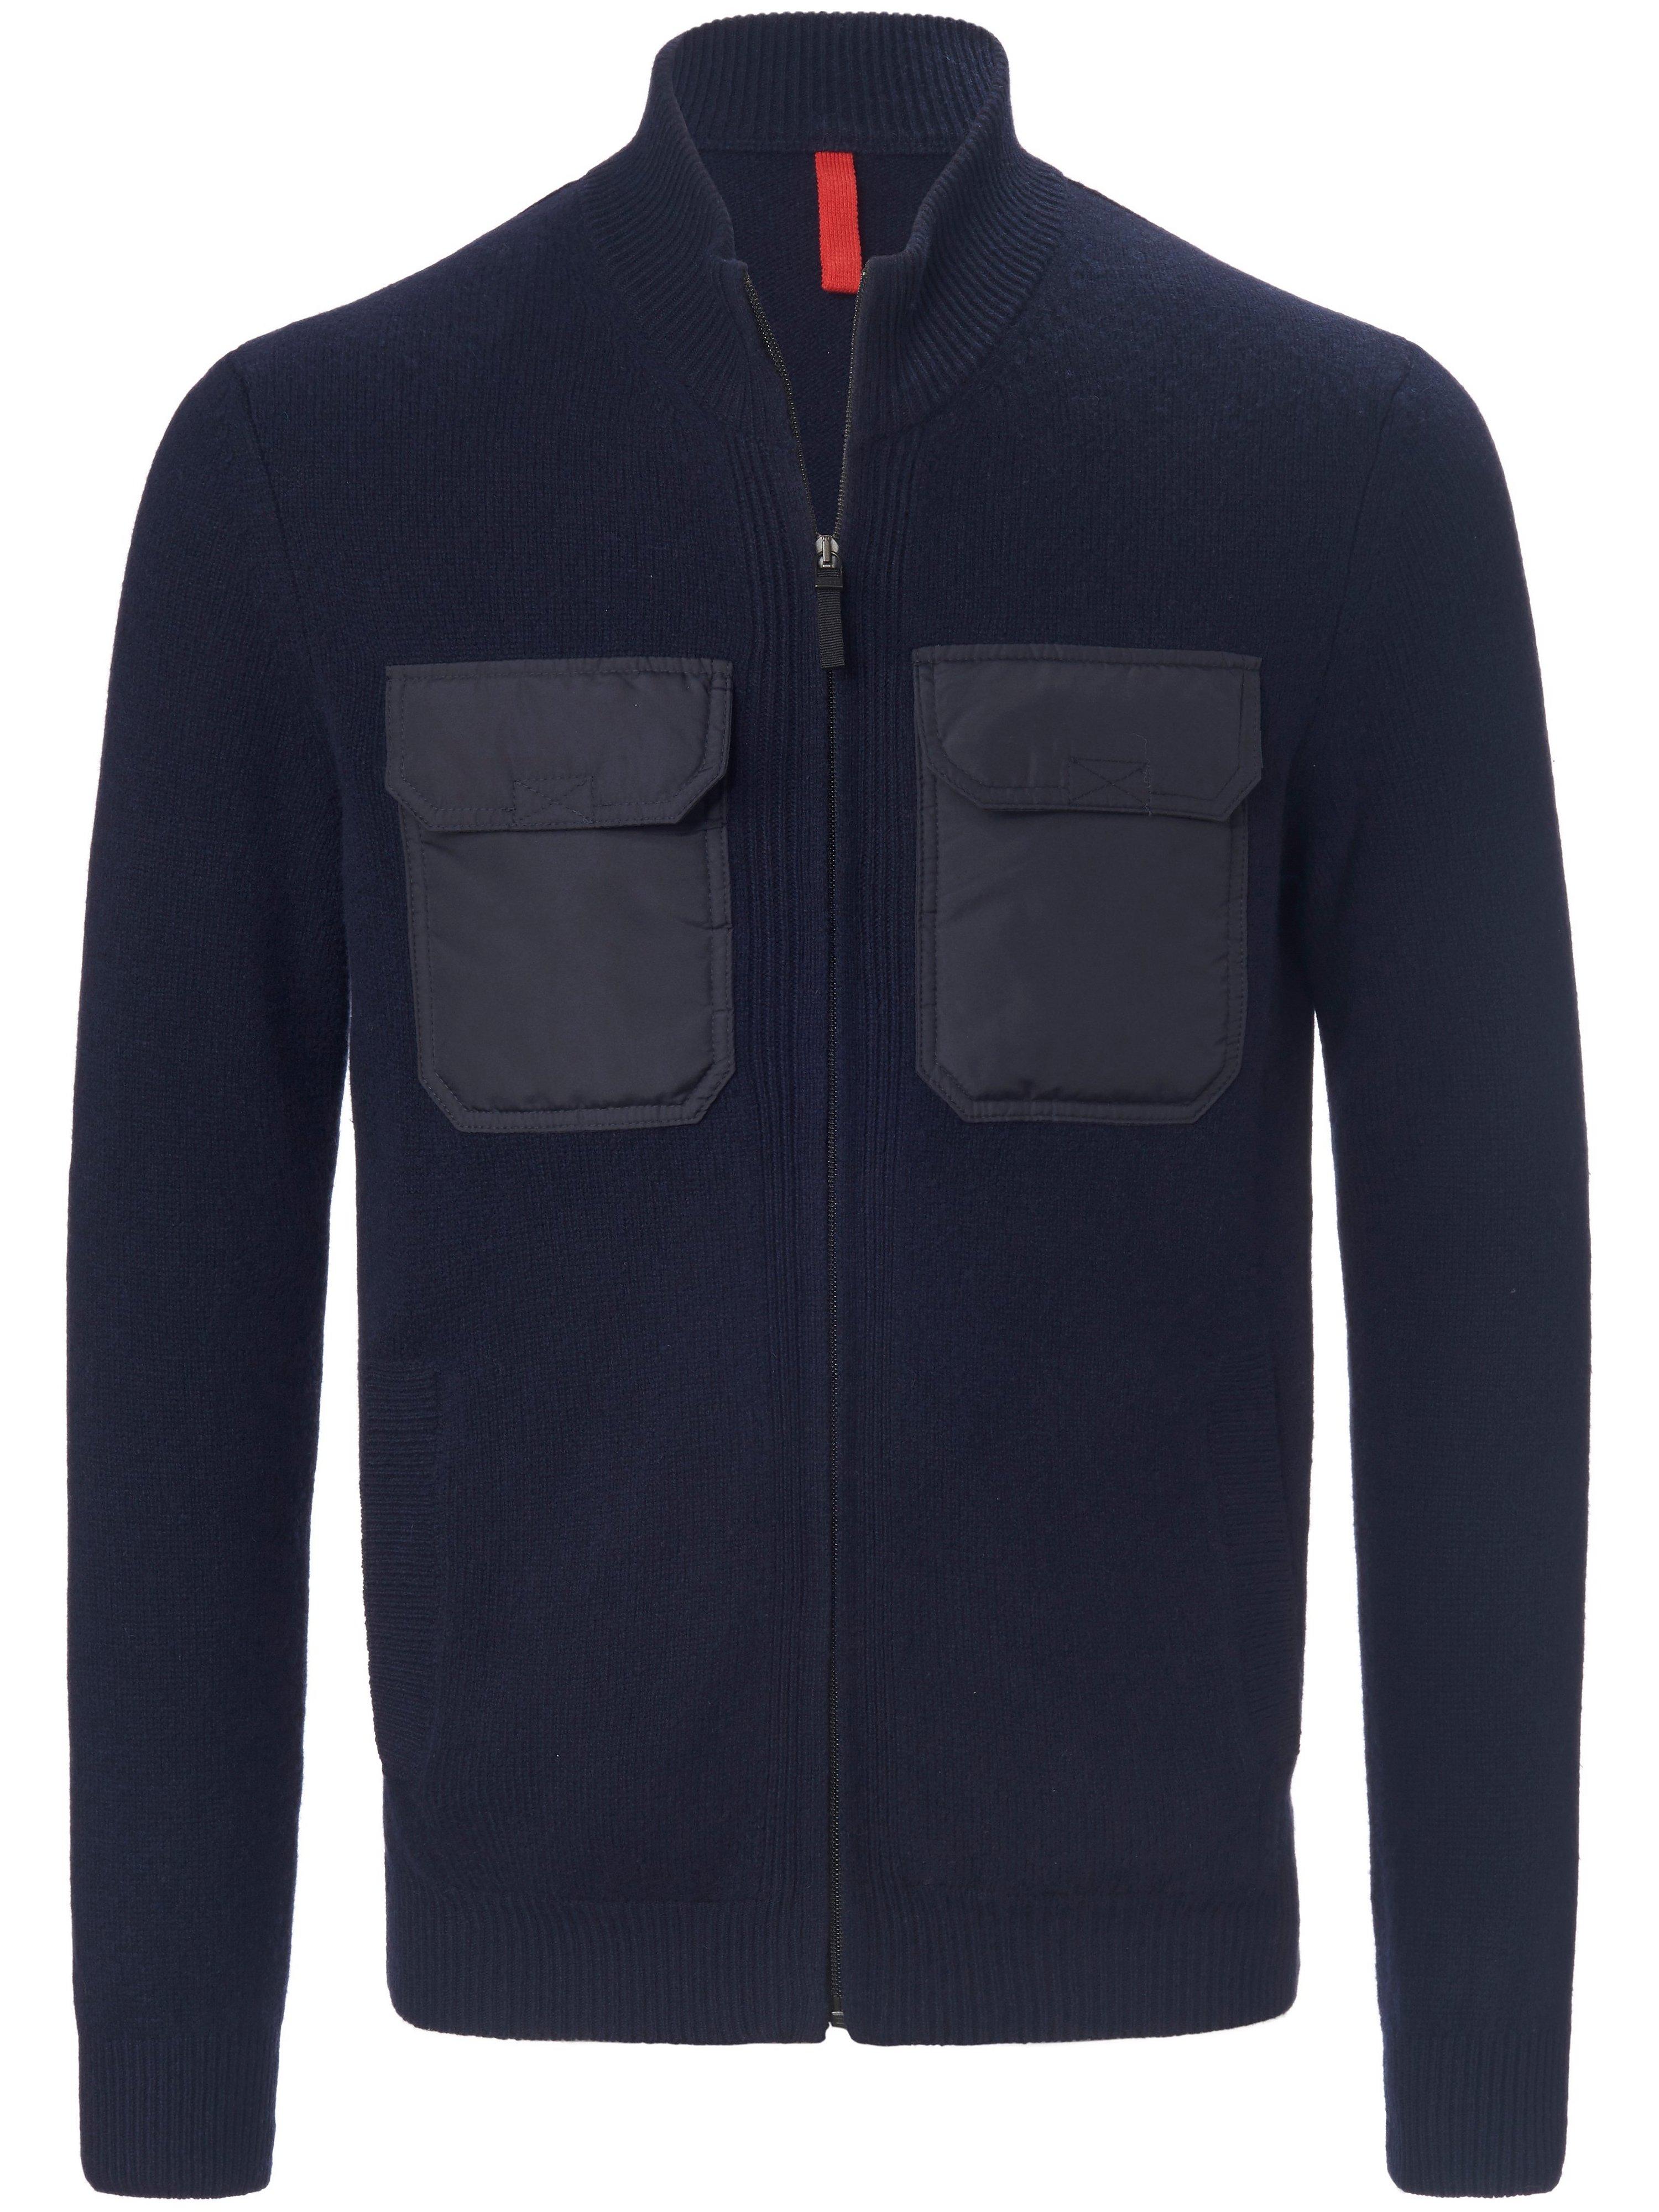 Vest 100% scheerwol staande halsboord Van MAERZ Muenchen blauw